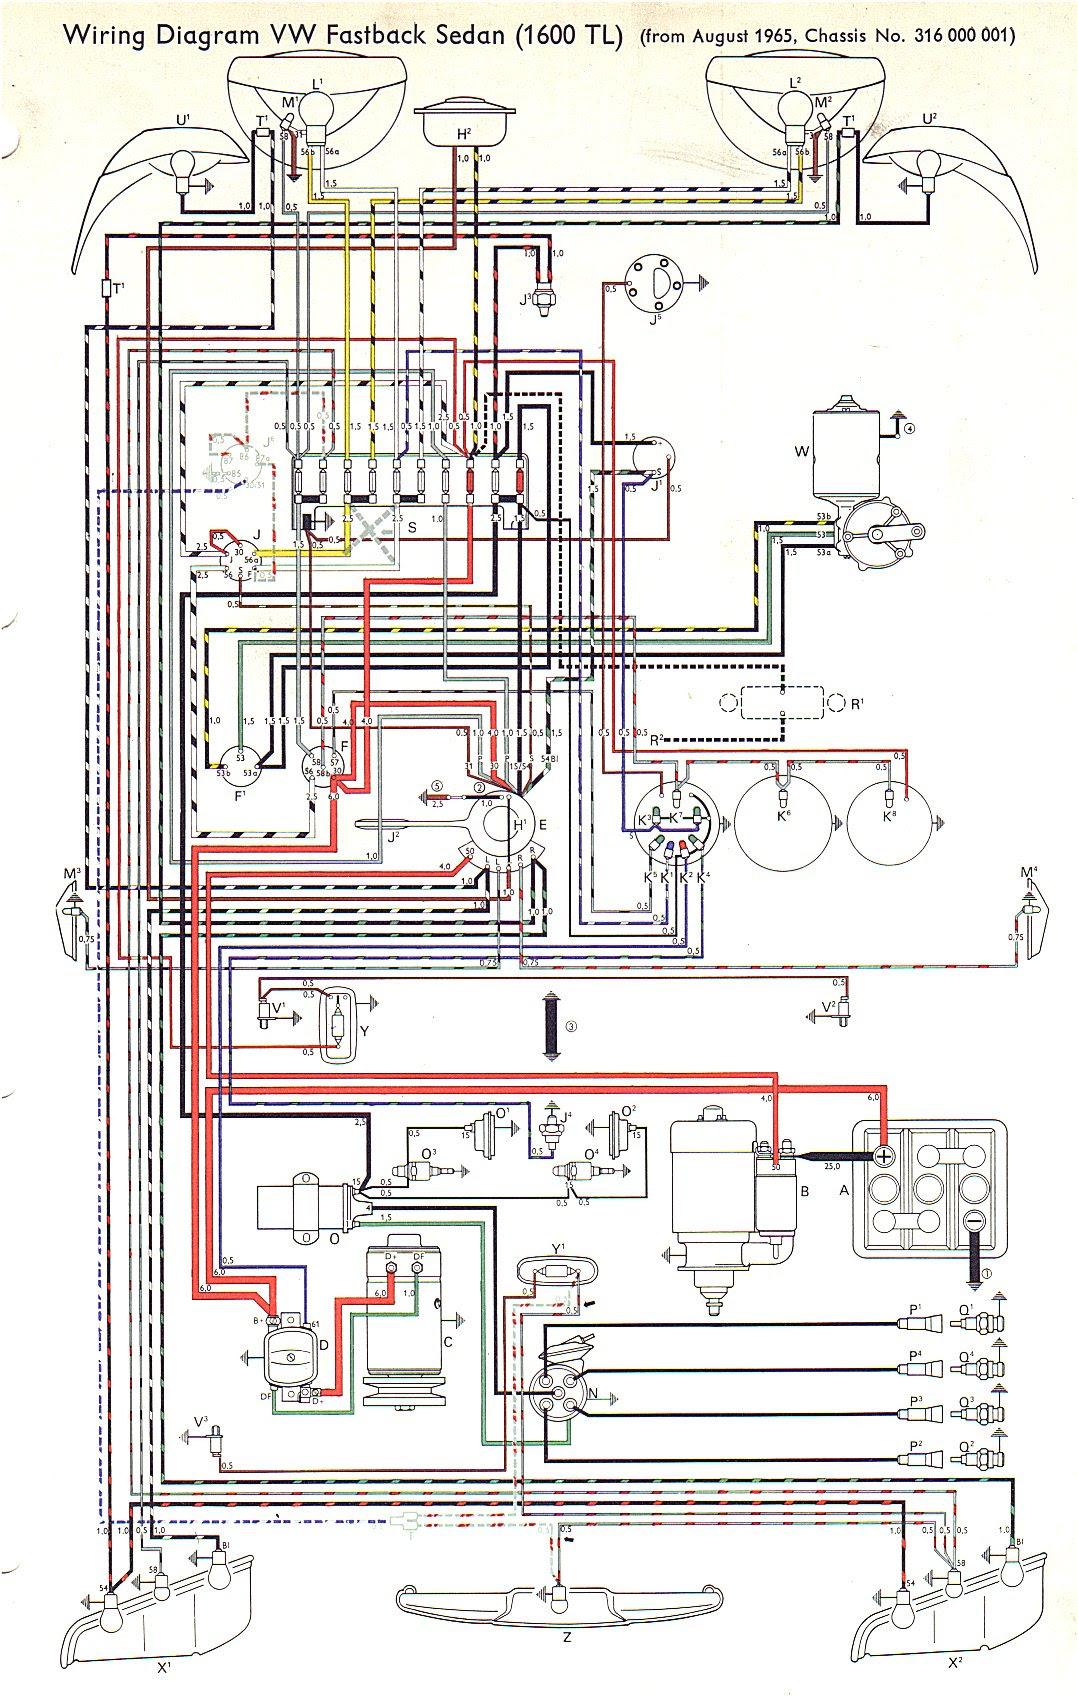 Vw Passat Wiring Diagram For 2012 Best Wiring Diagrams Install Install Ekoegur Es